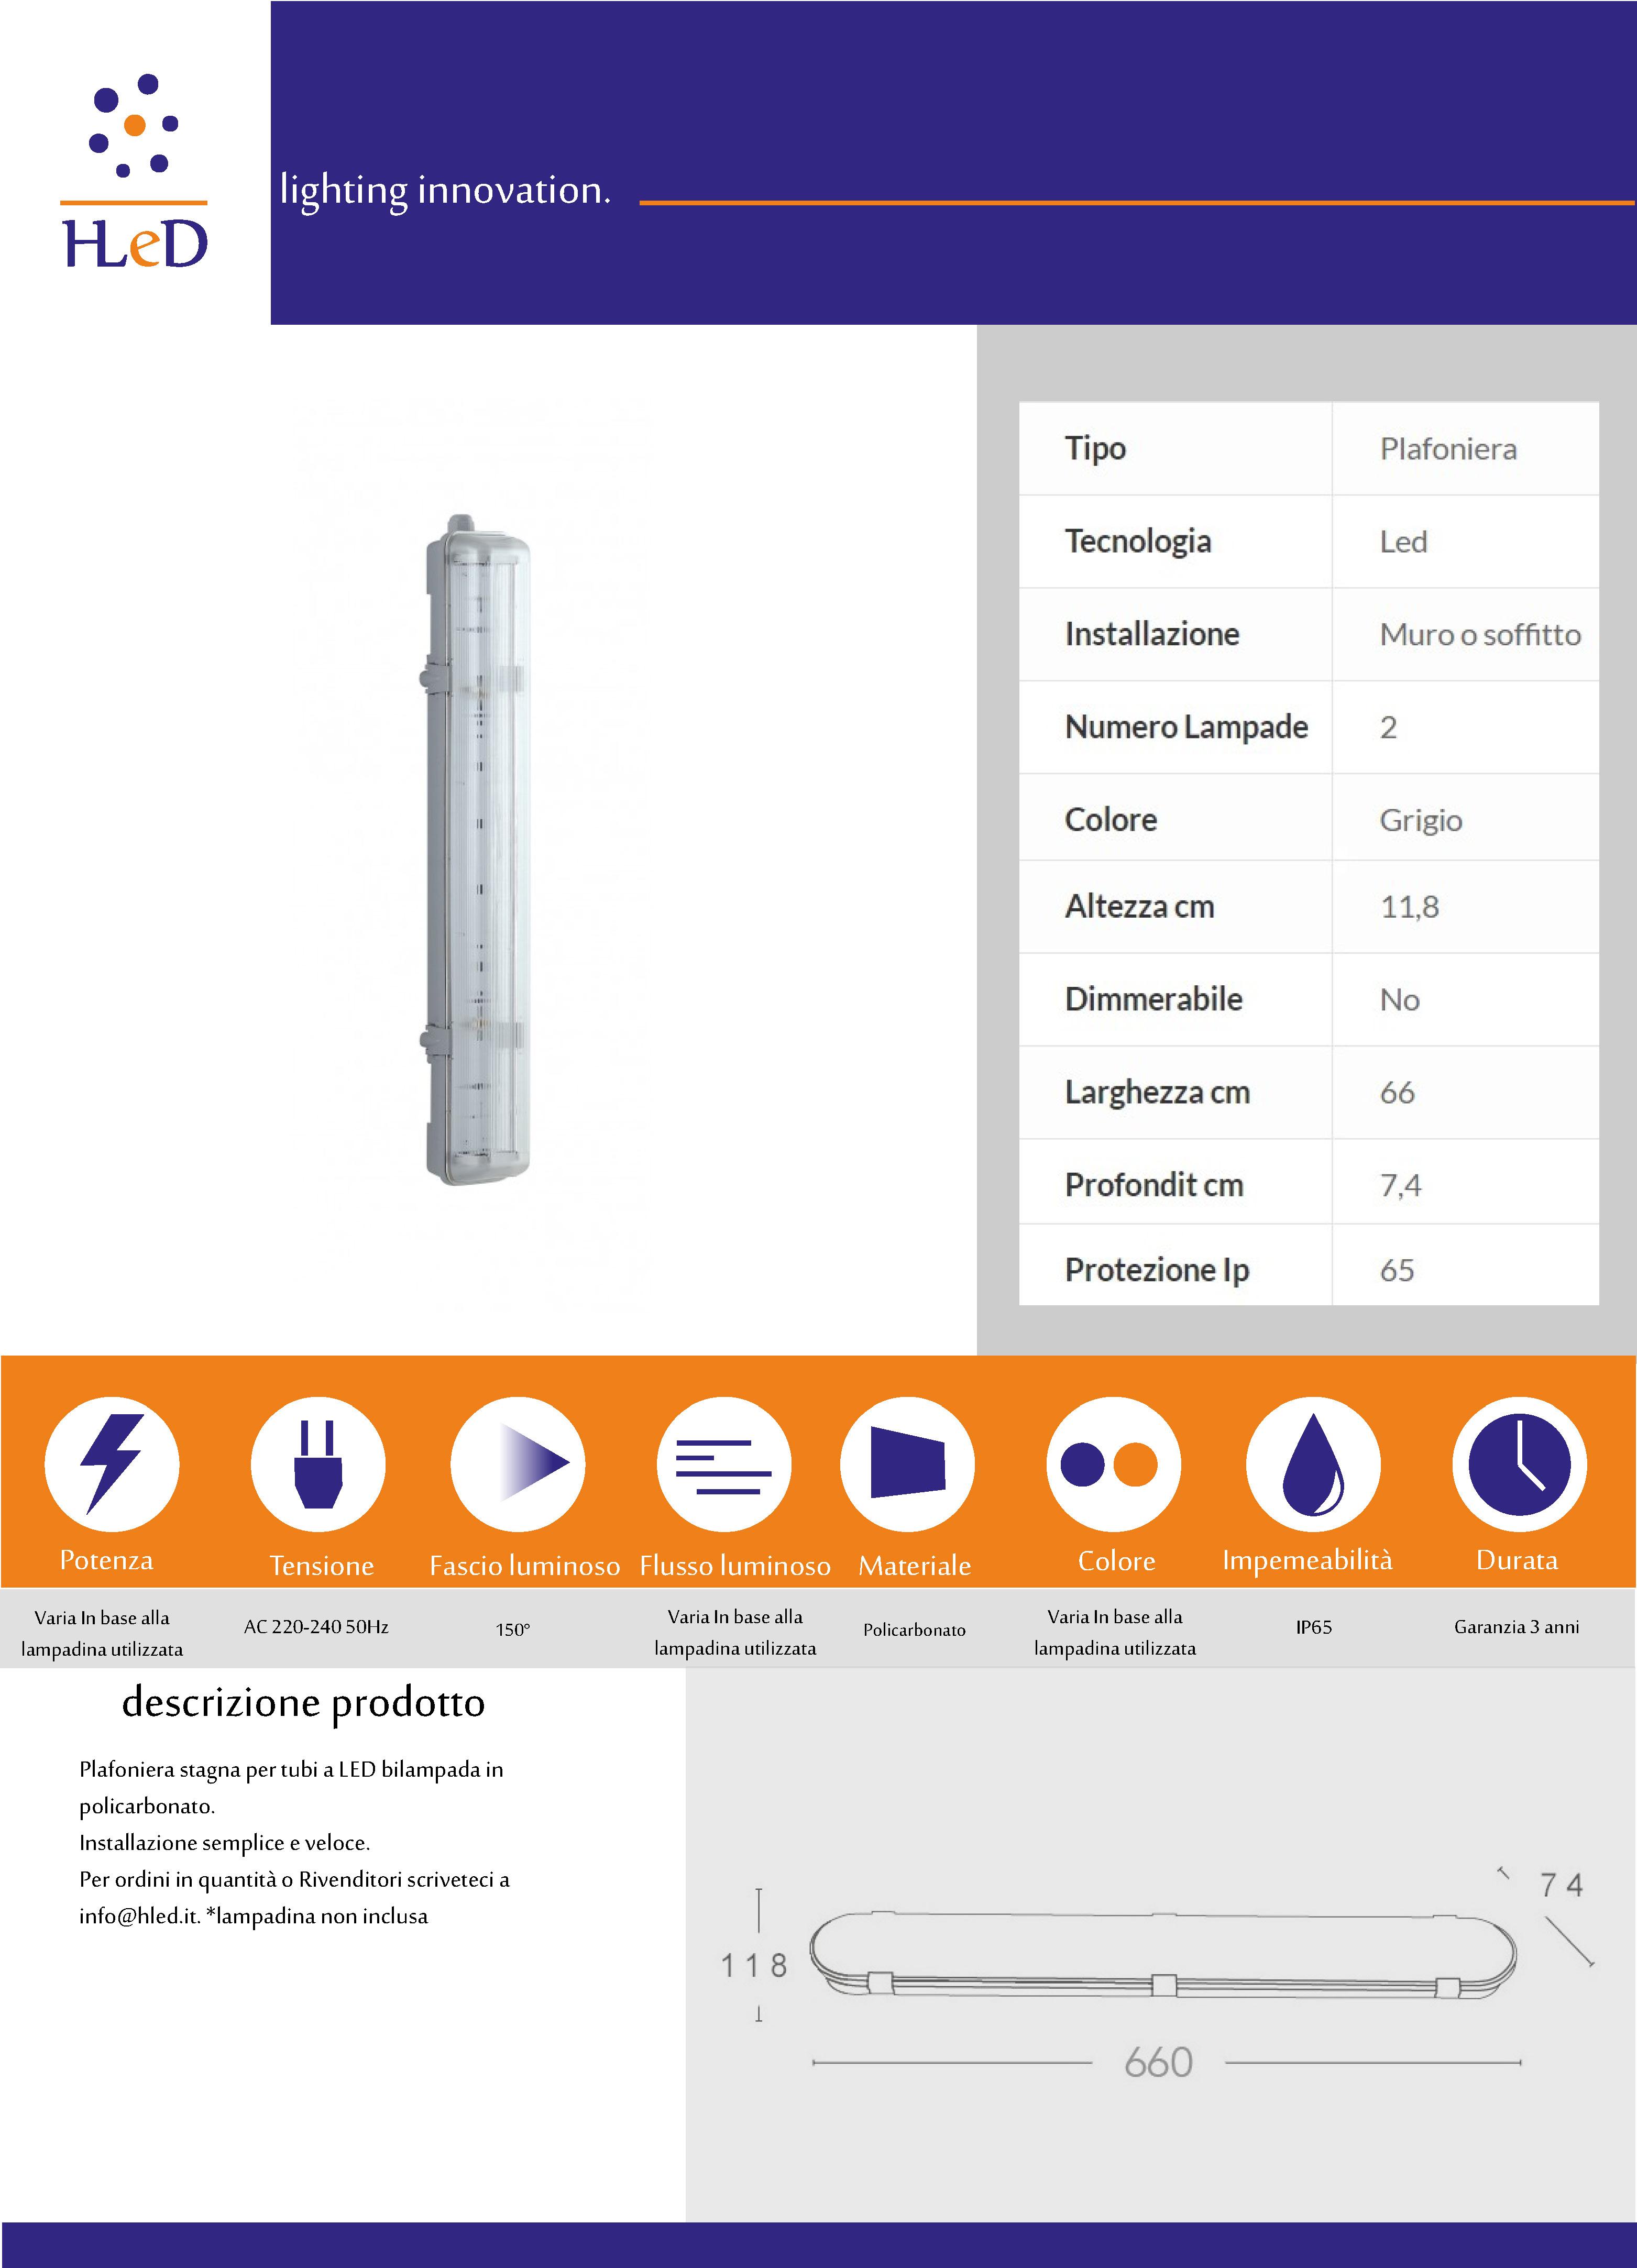 Plafoniera T8 60cm